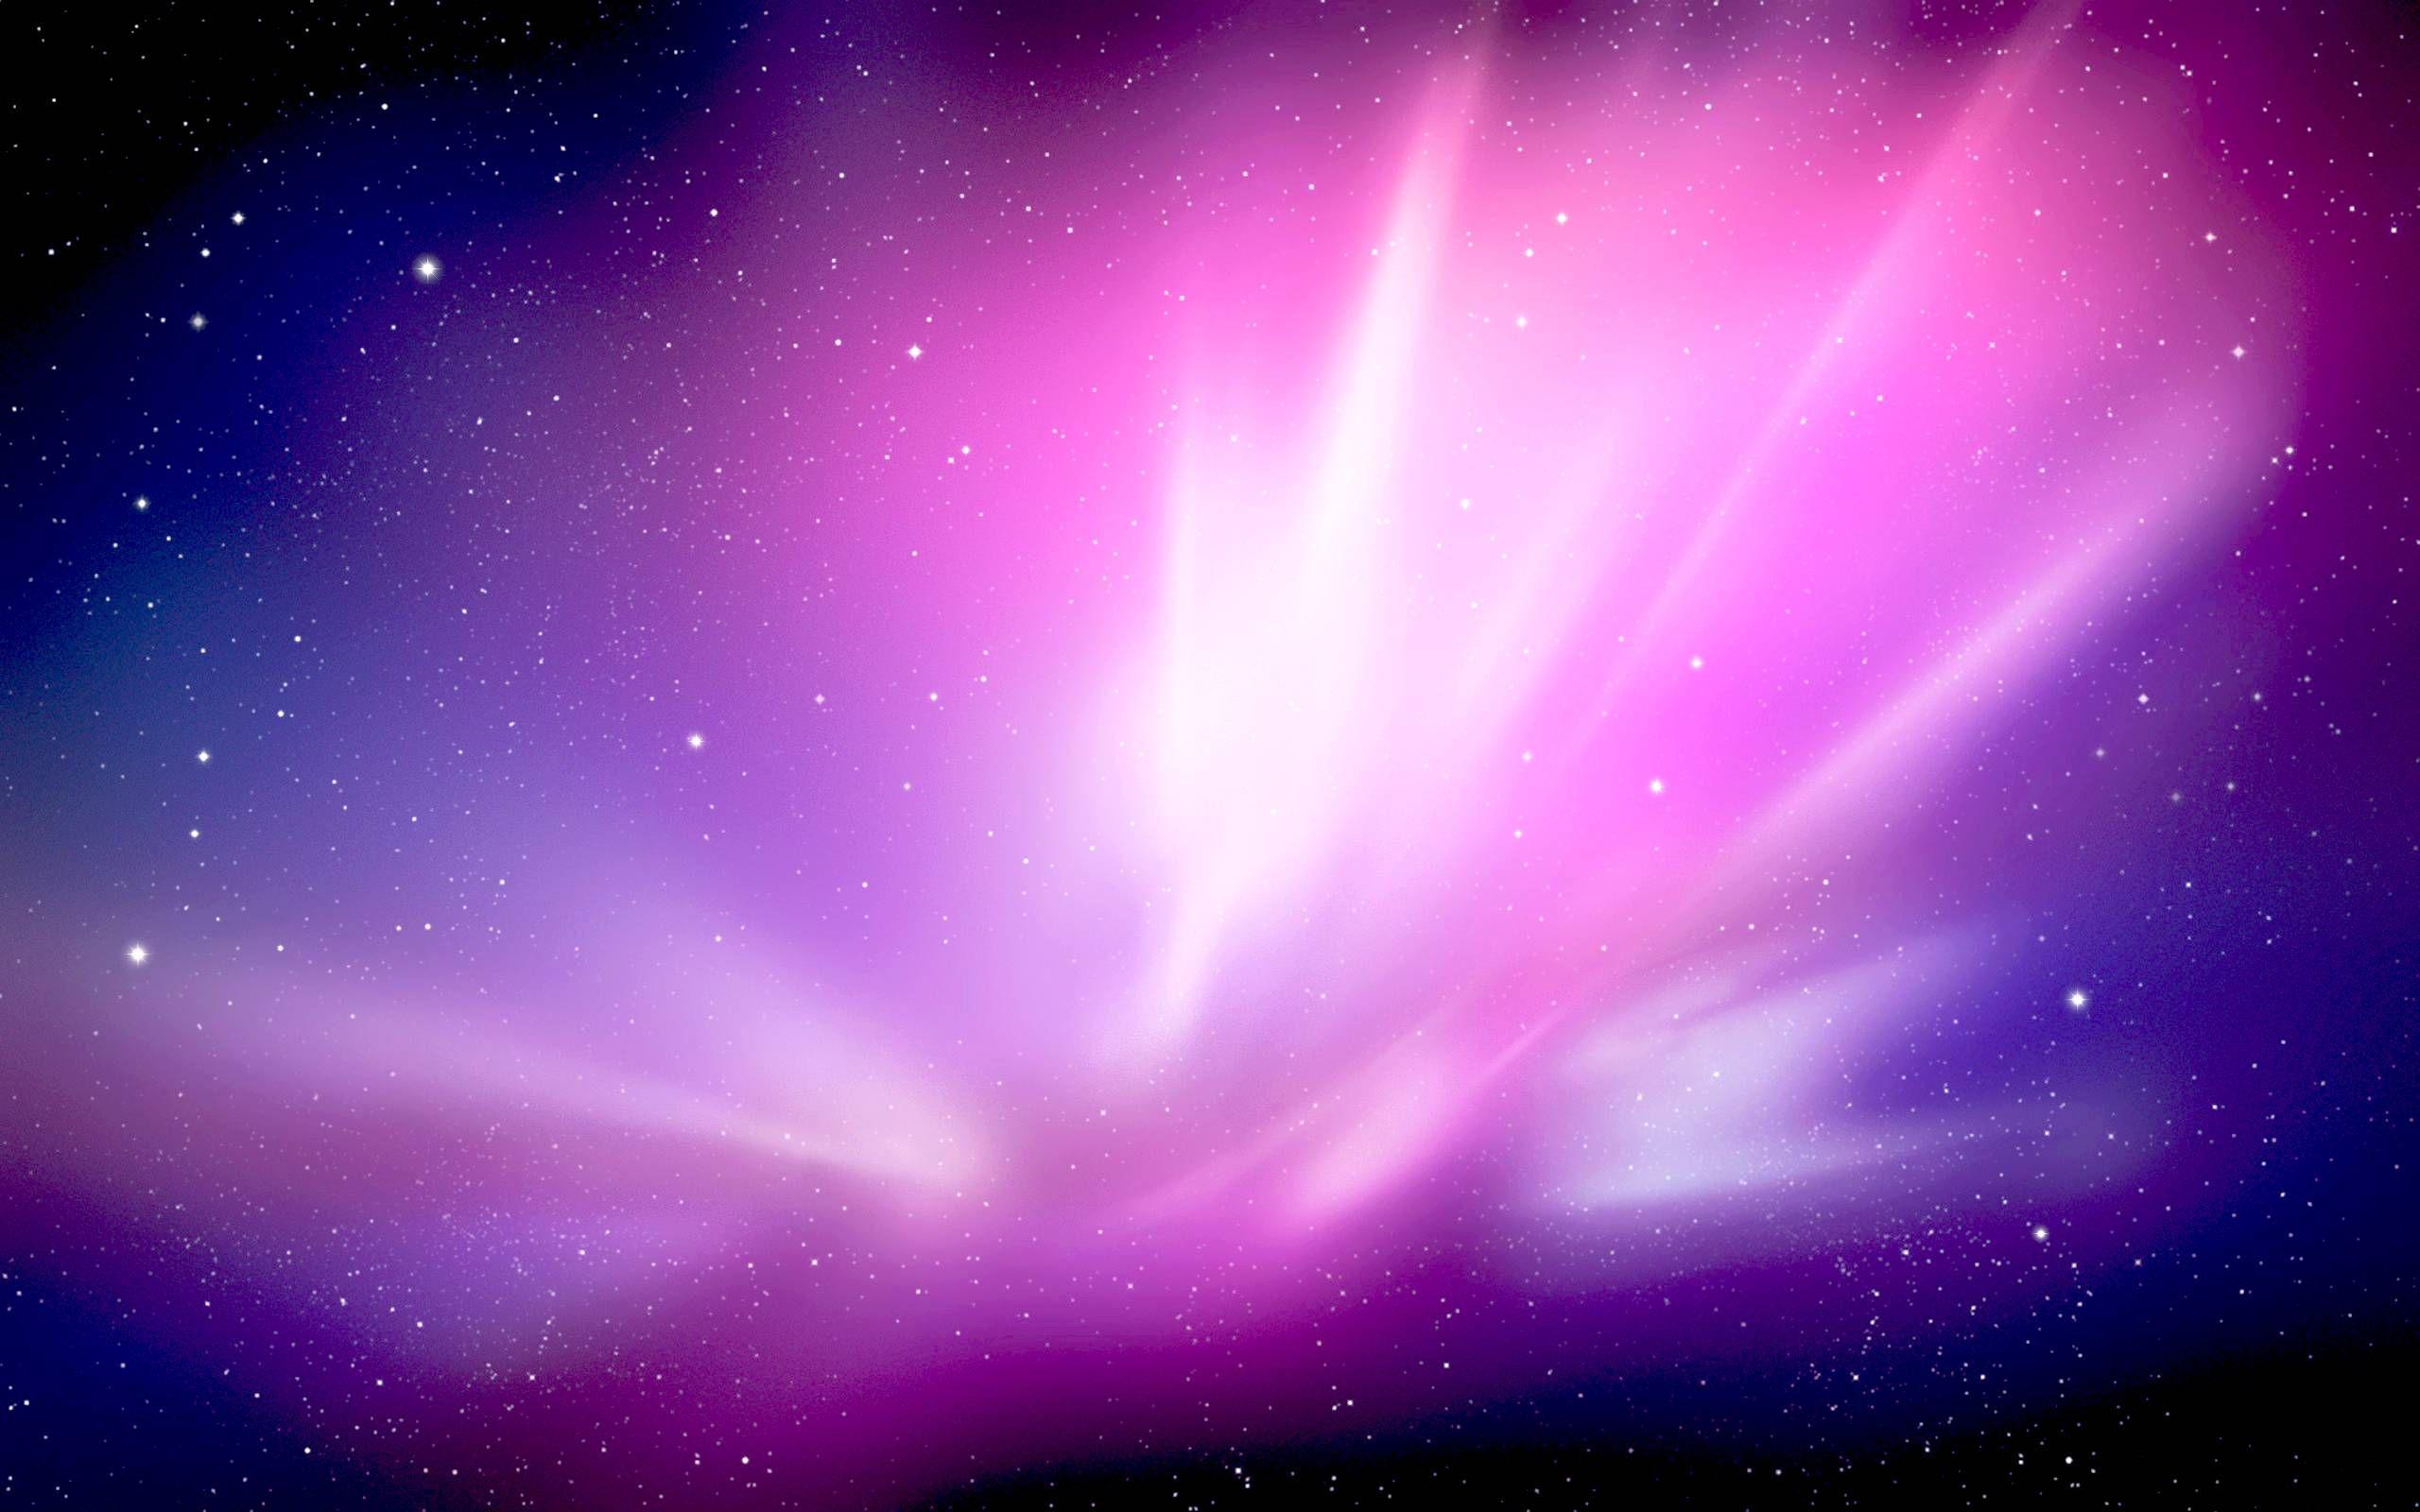 Amazing Wallpaper Mac Snow Leopard - dd8f8ebe5441354a74581c9a531ea9d6  Gallery_28180.jpg